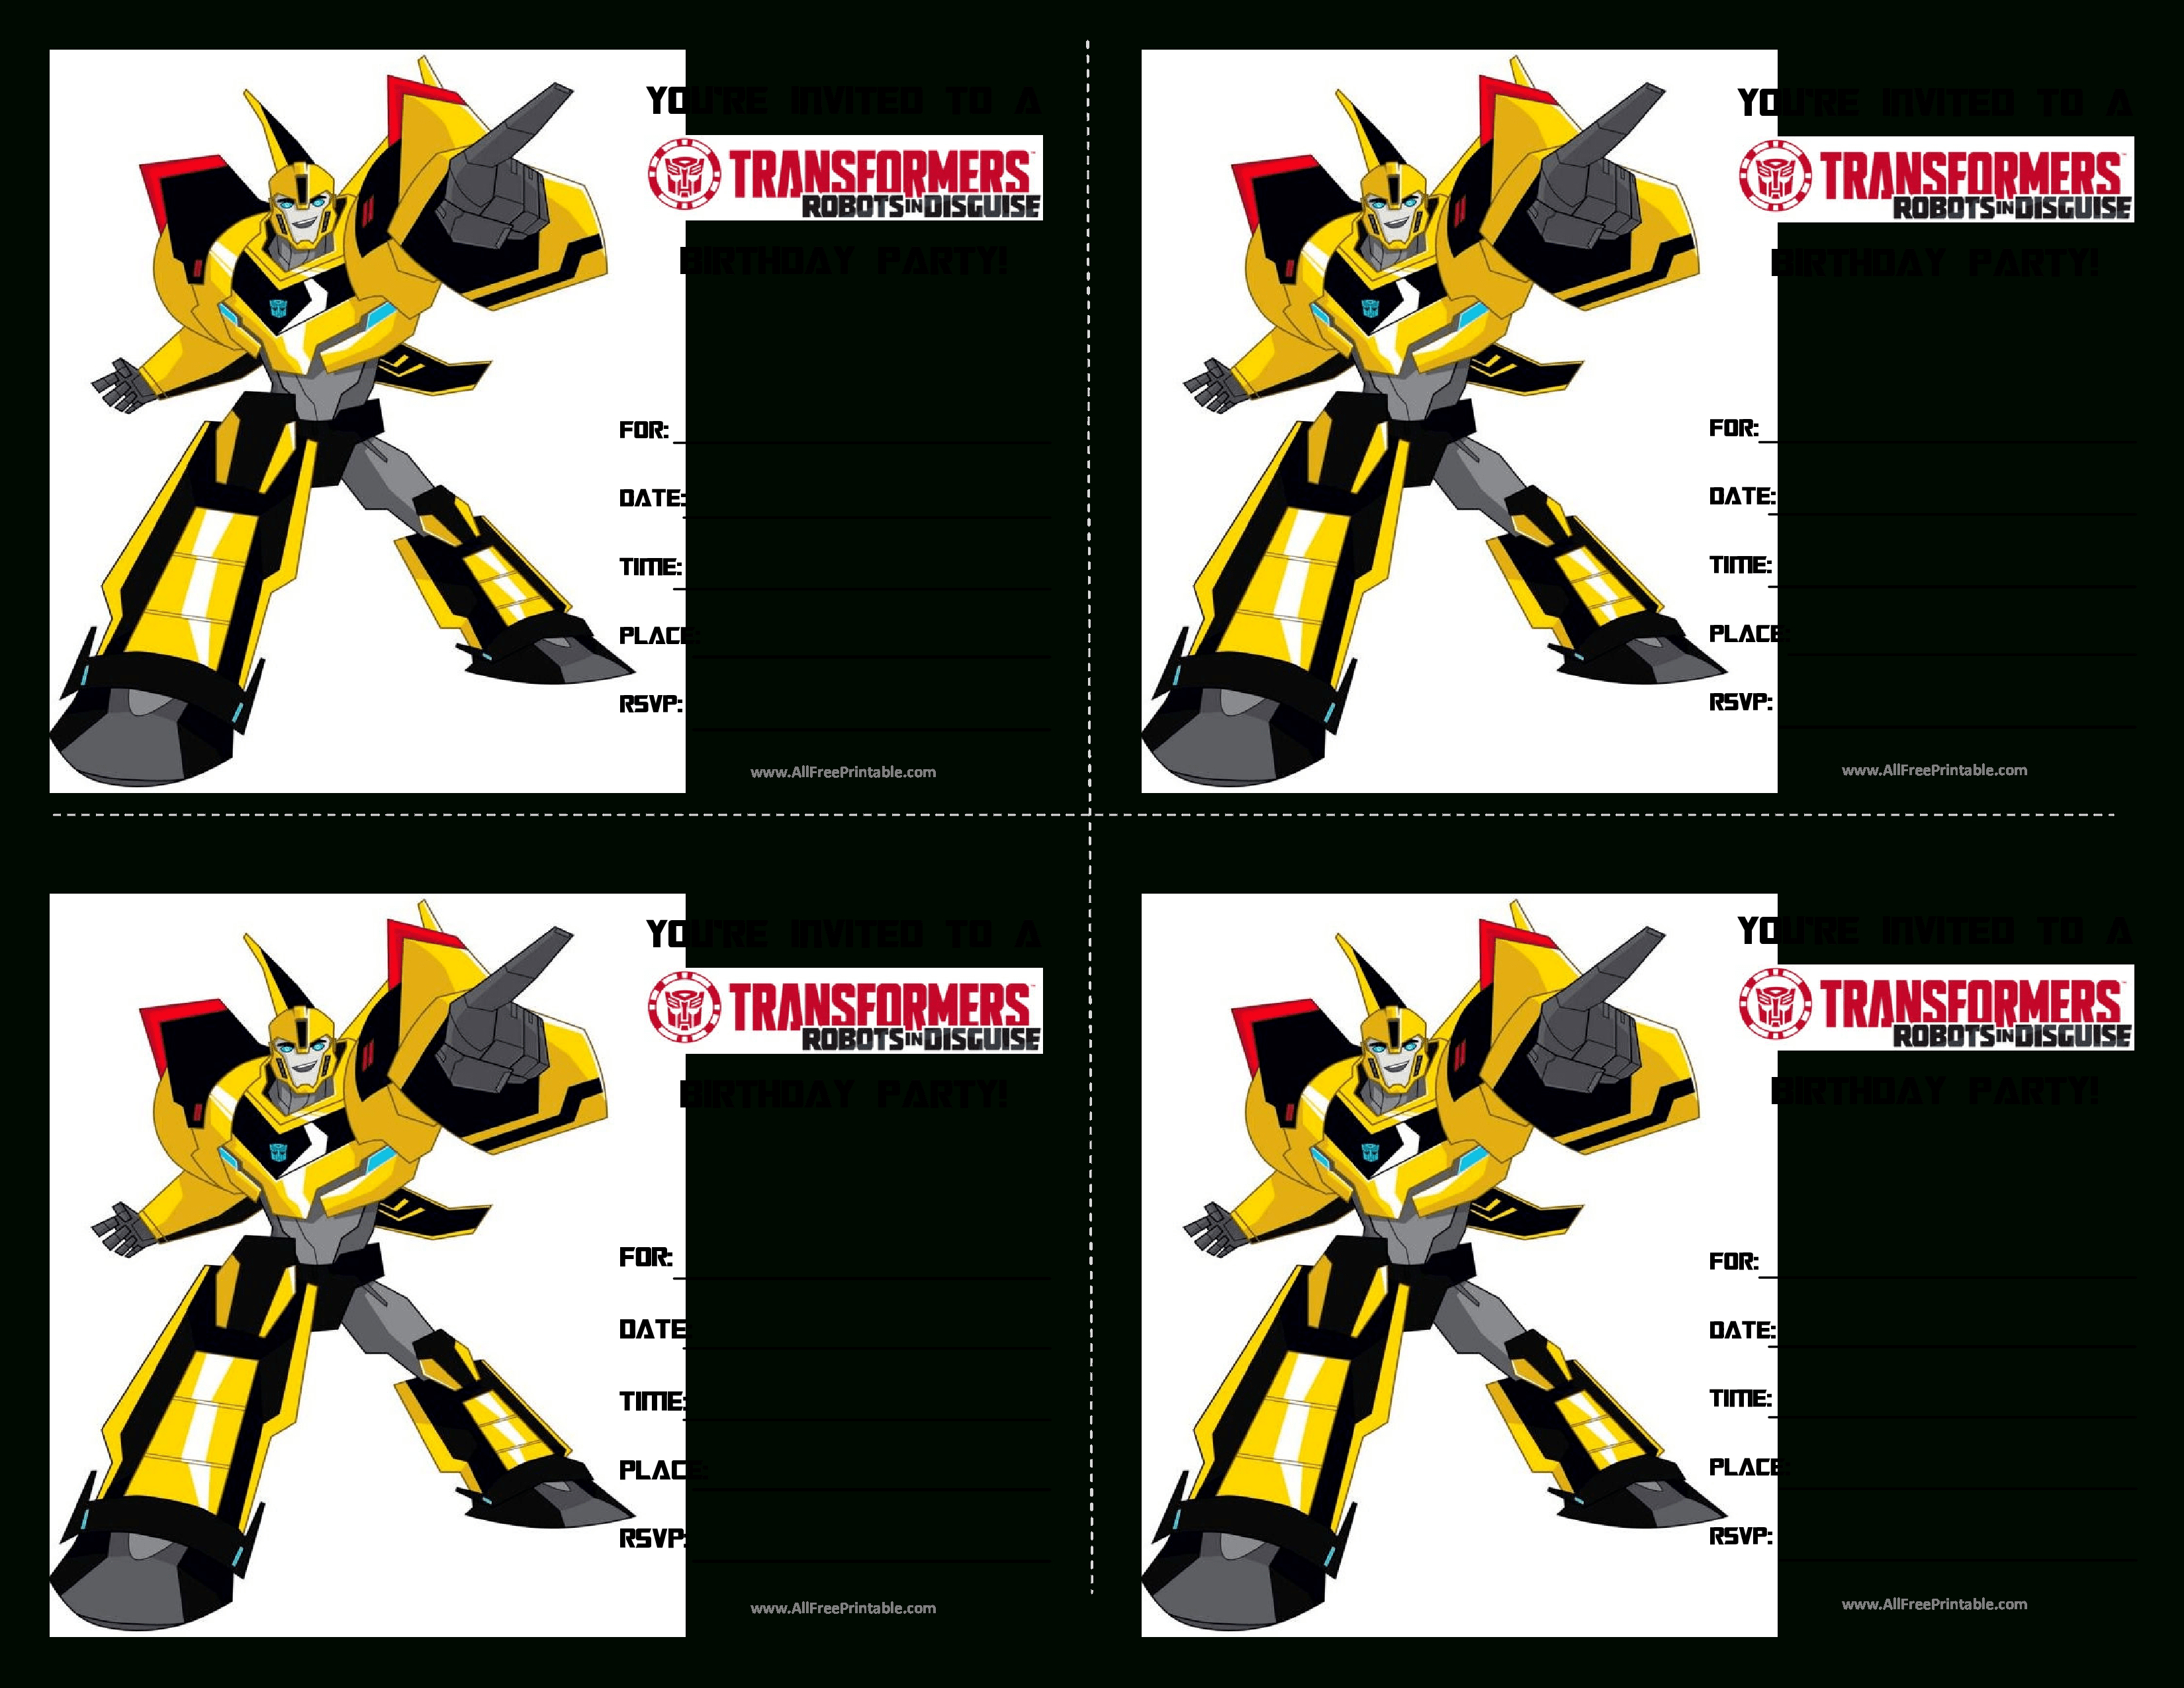 Transformers Birthday Invitations - Anarchistshemale - Transformers Party Invitations Free Printable